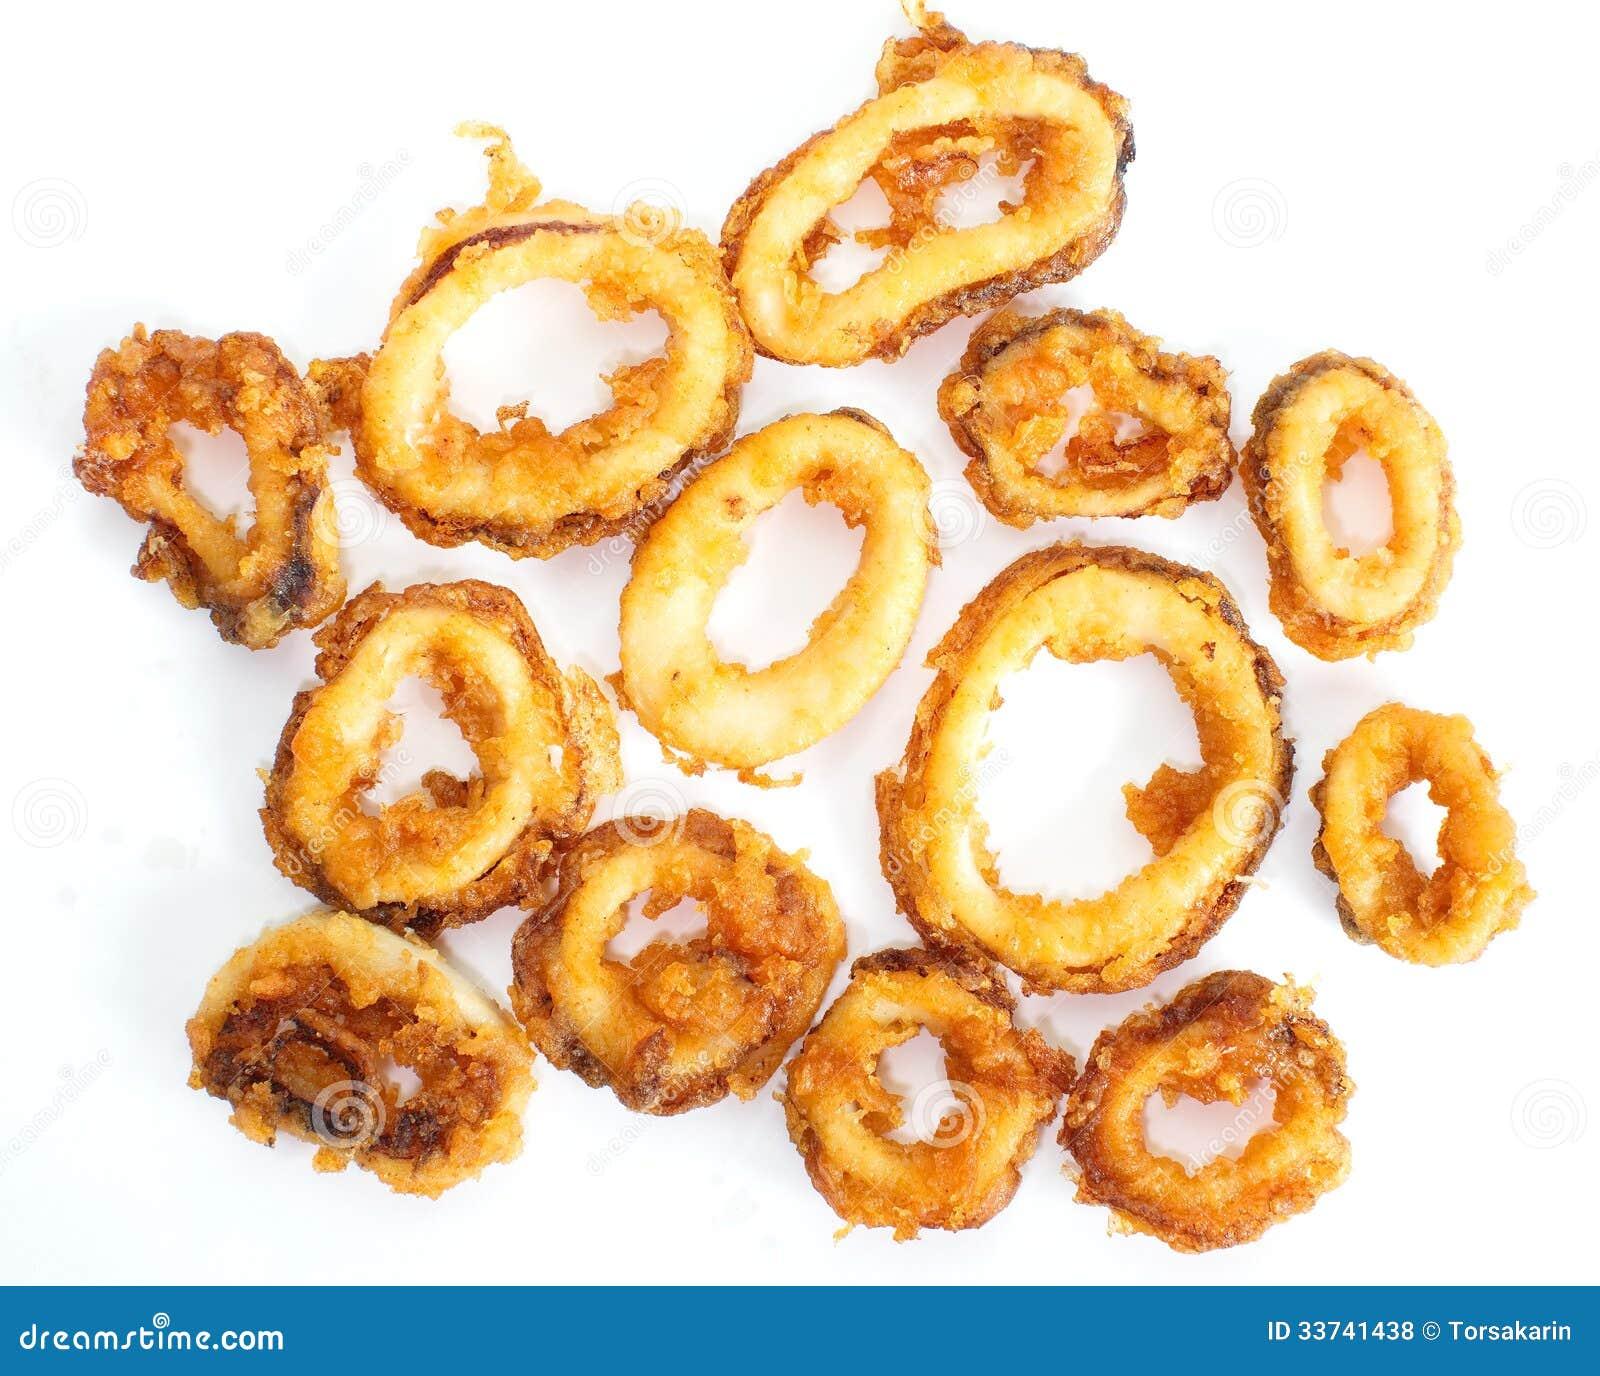 Deep Fried Calamari Rings Royalty Free Stock Photos - Image: 33741438